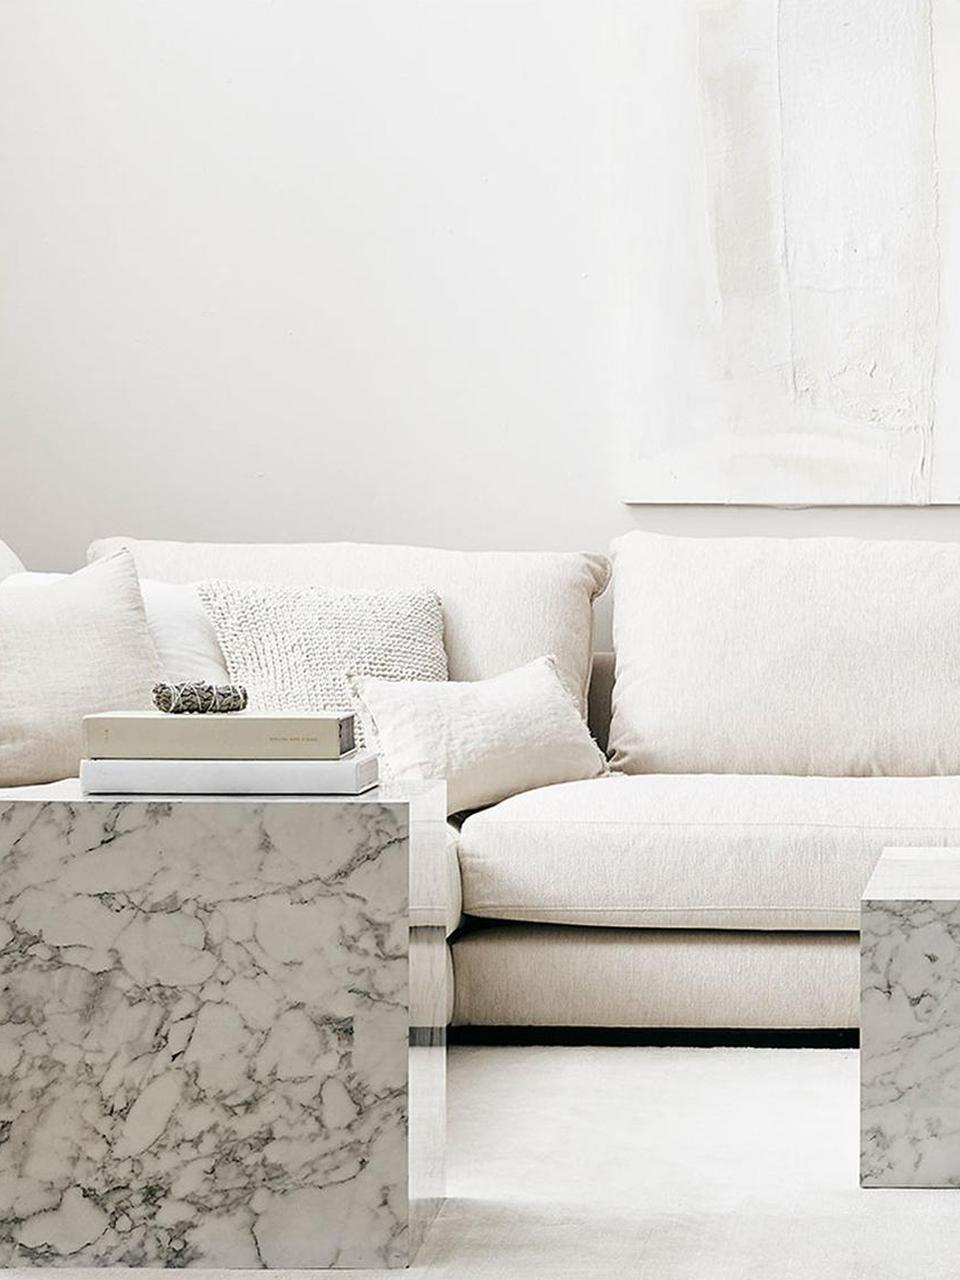 Federa arredo in lino bianco crema con frange Luana, 100% lino, Bianco crema, Larg. 30 x Lung. 50 cm